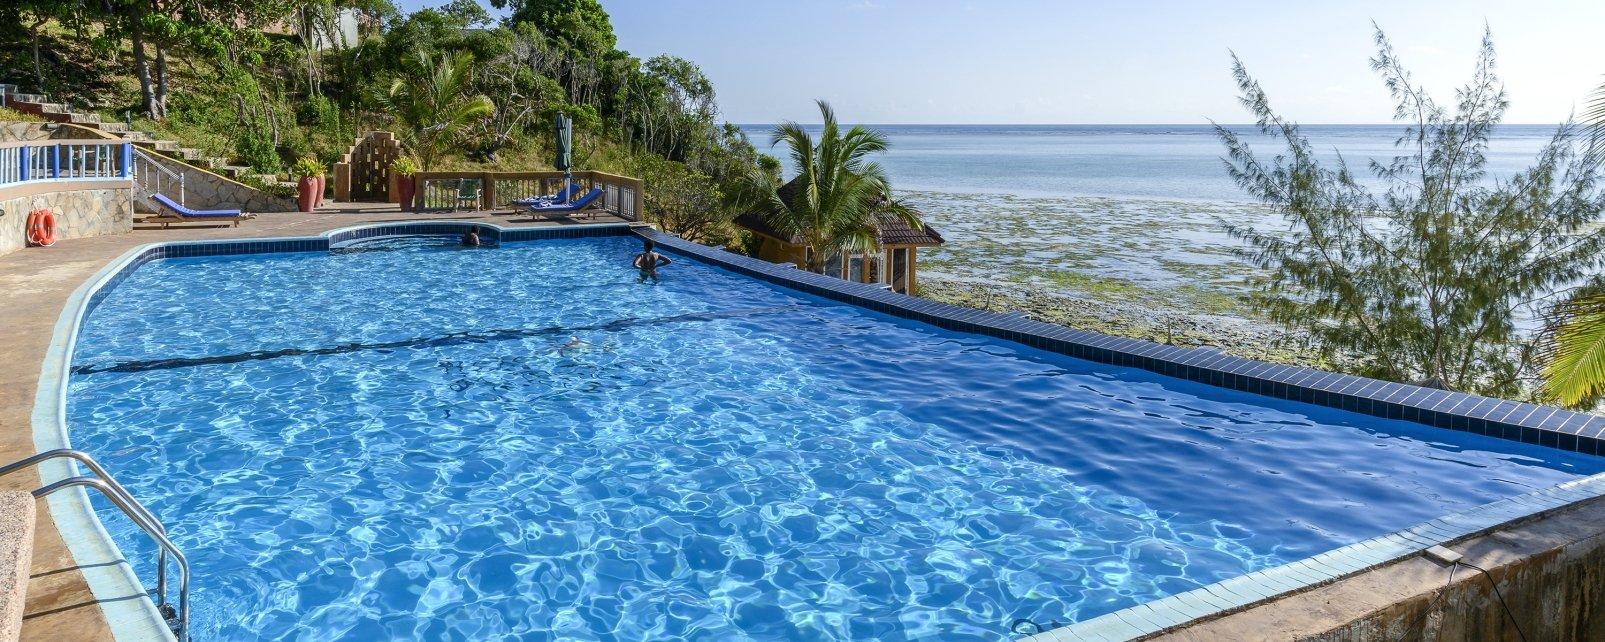 Ôclub Ras Michamvi Beach Resort